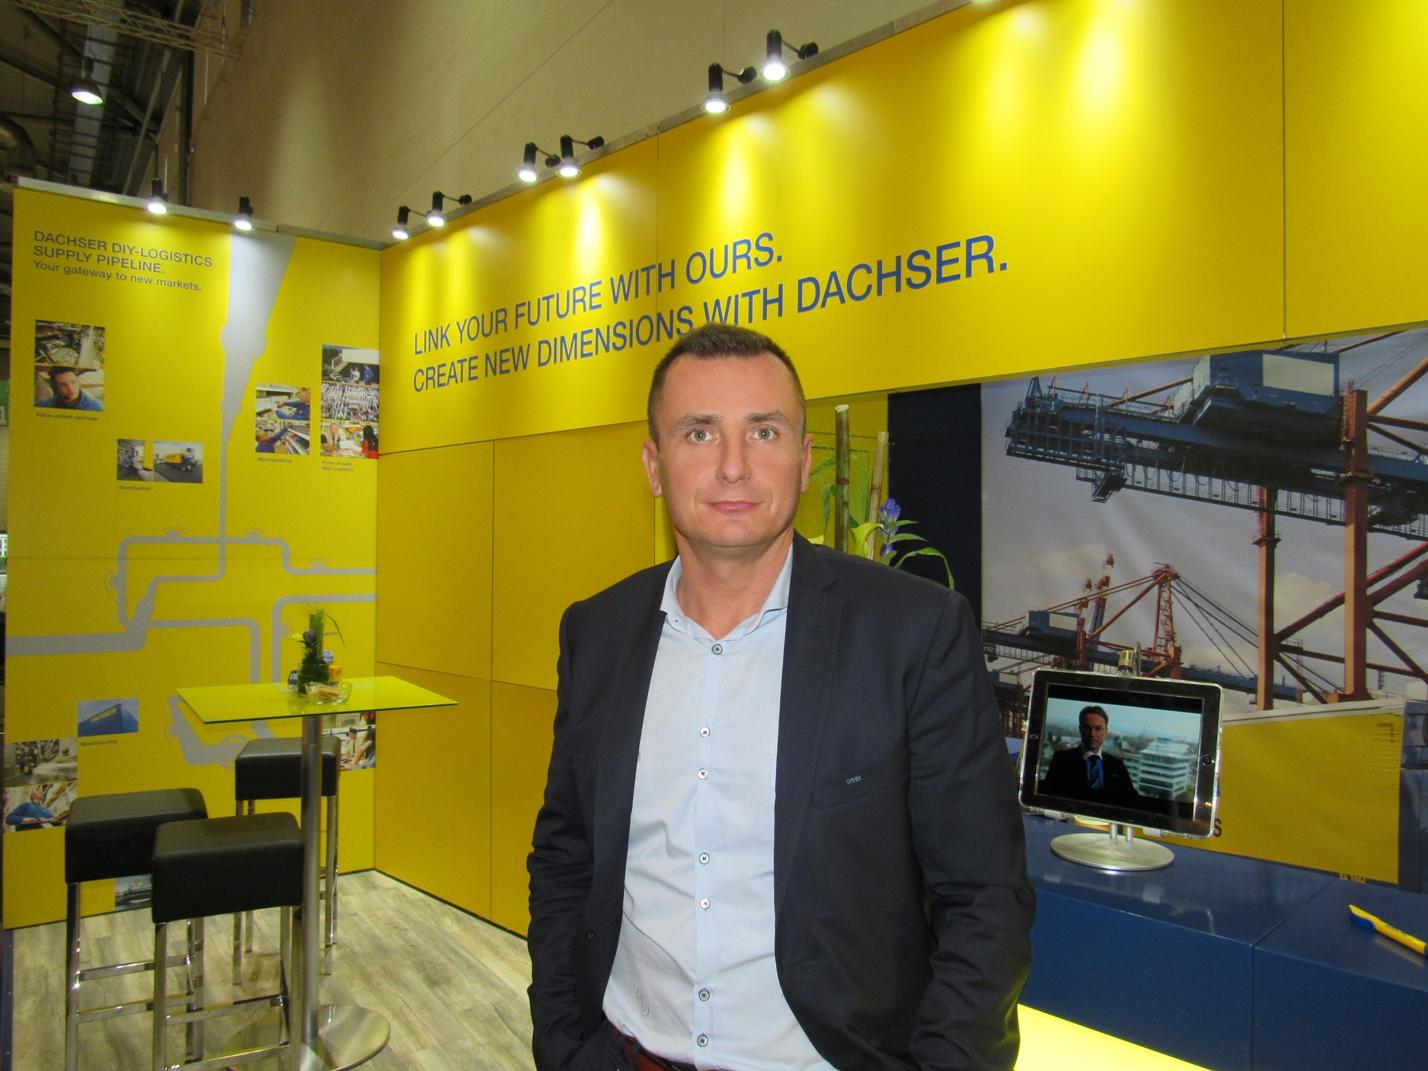 Juliusz Pakuński, kierownik Dachser DIY-Logistics w Polsce